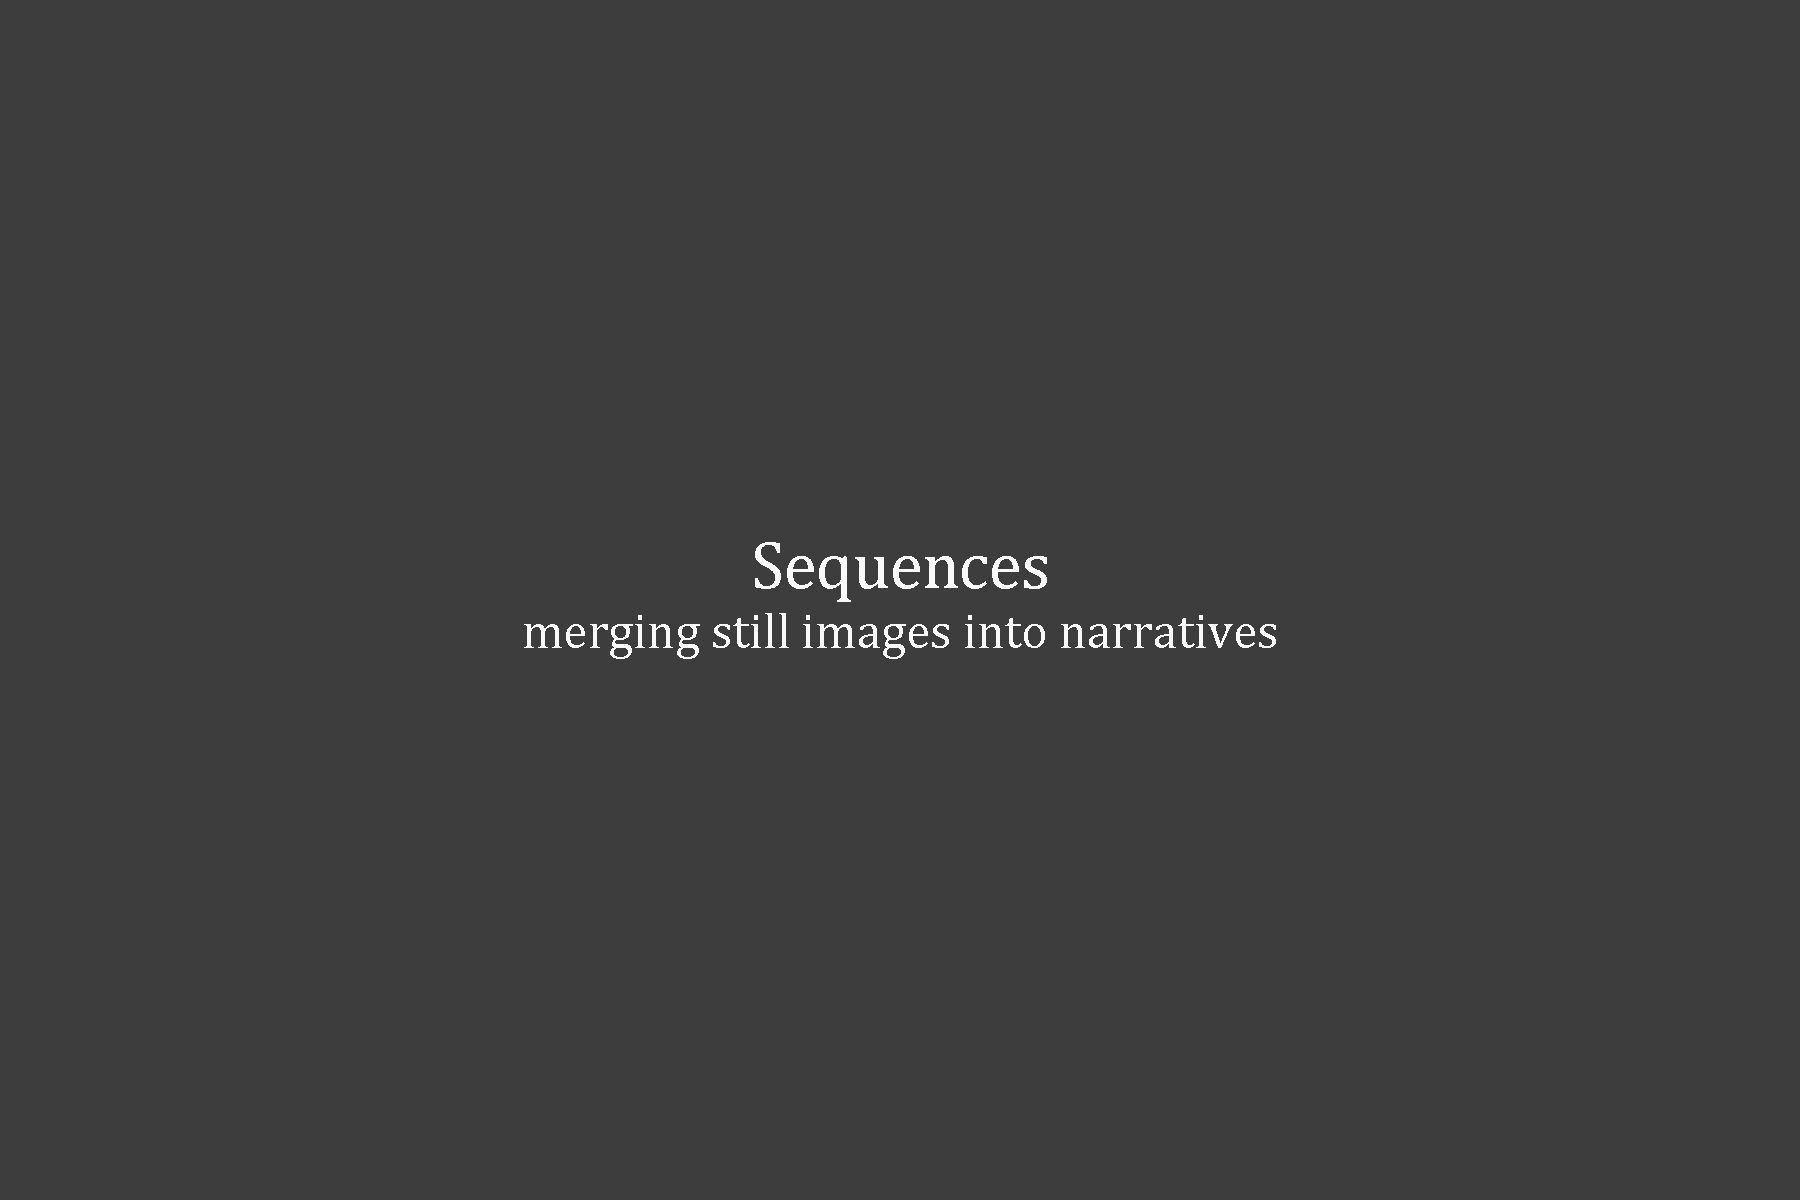 1sequences